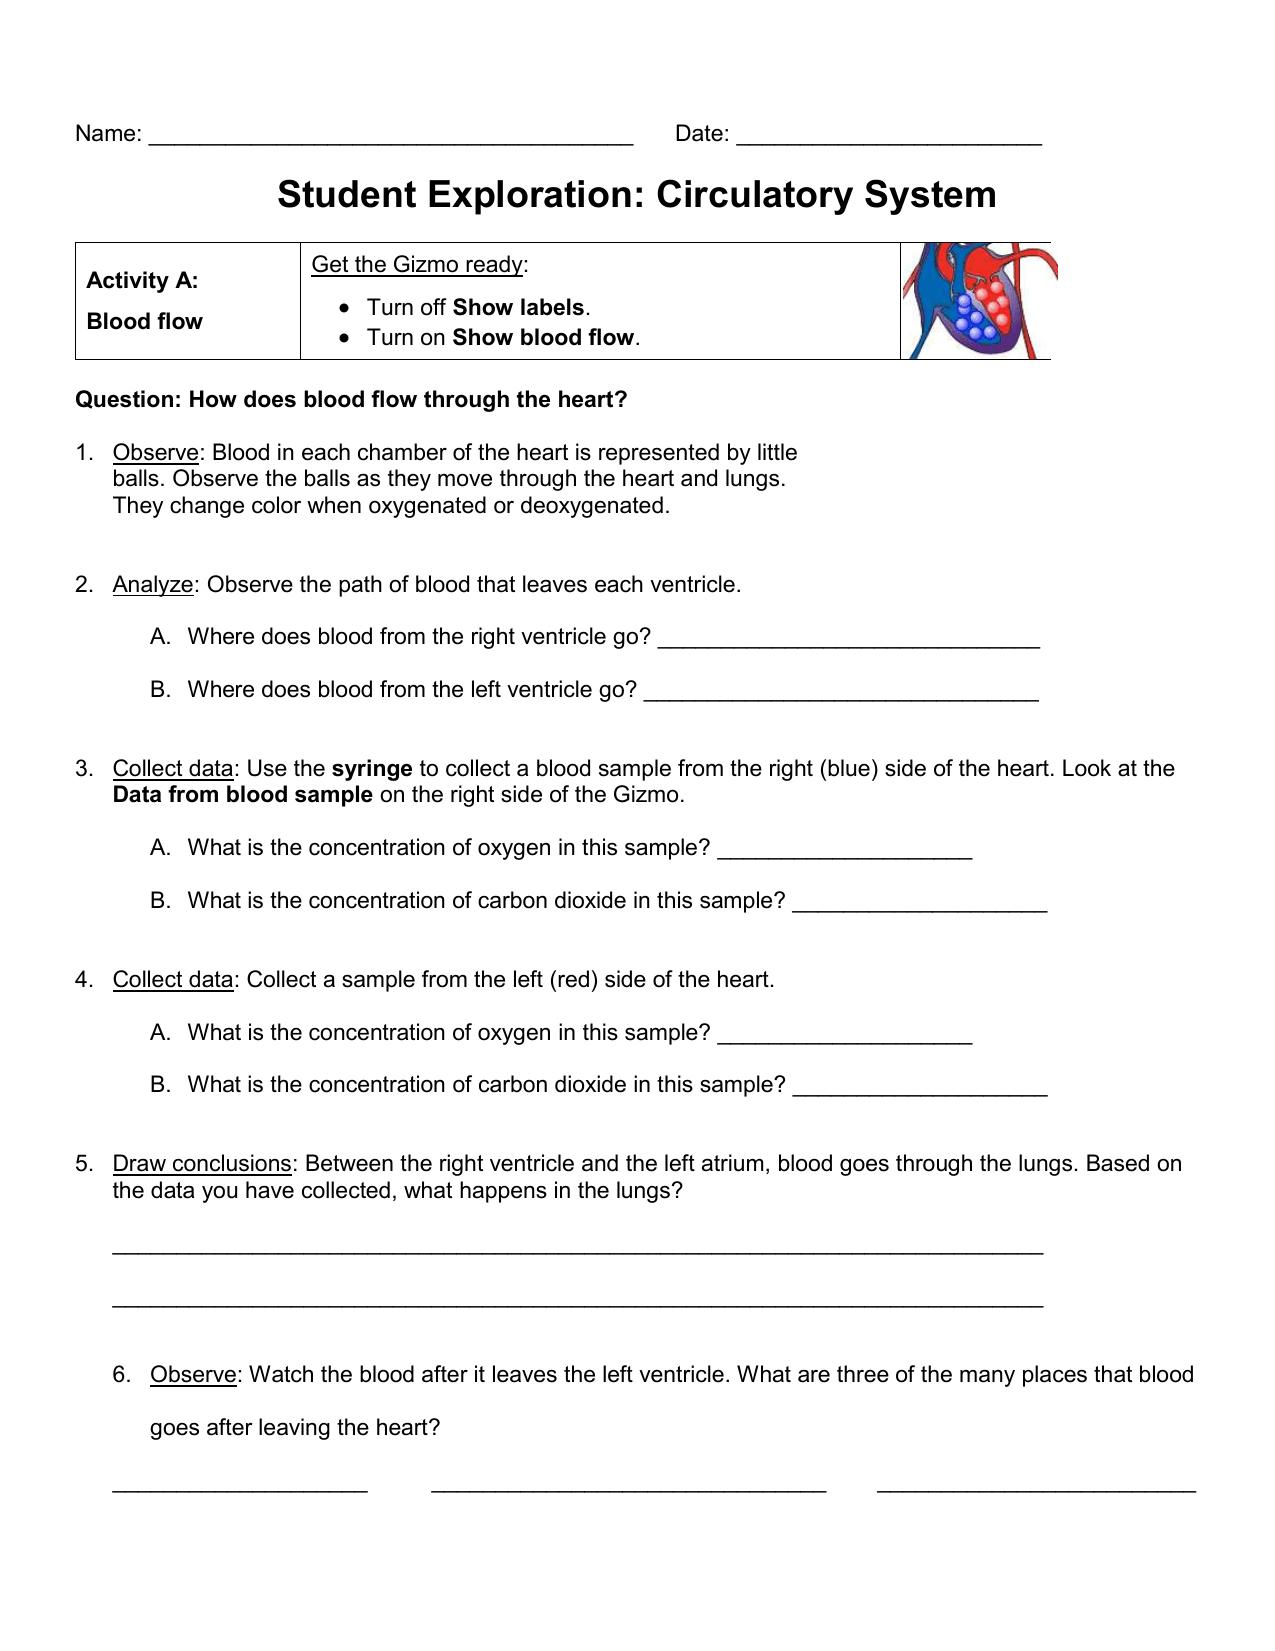 Student Exploration Circulatory System